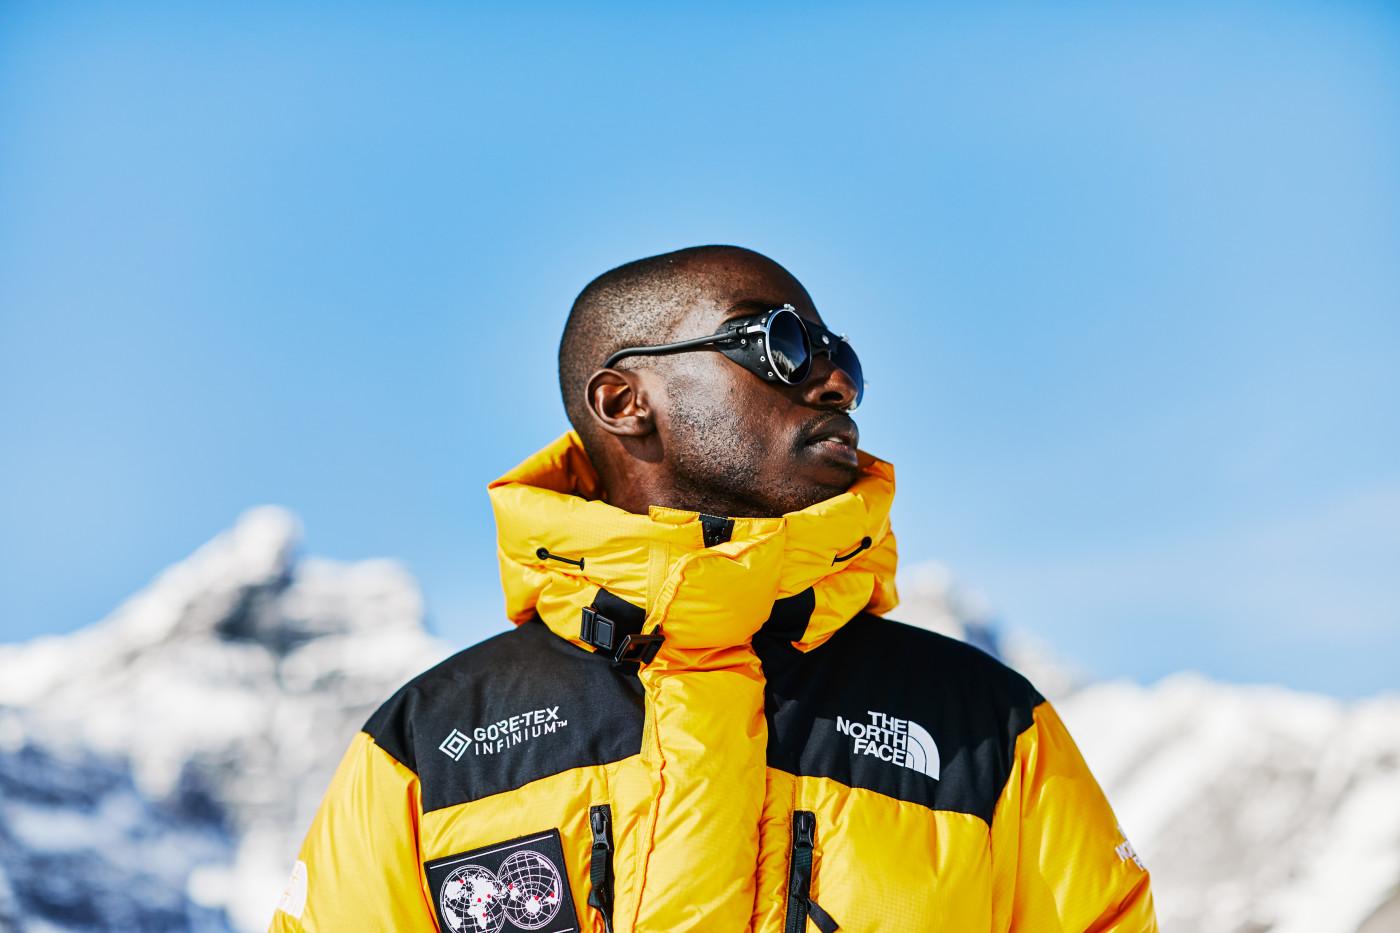 north-face-7-summits